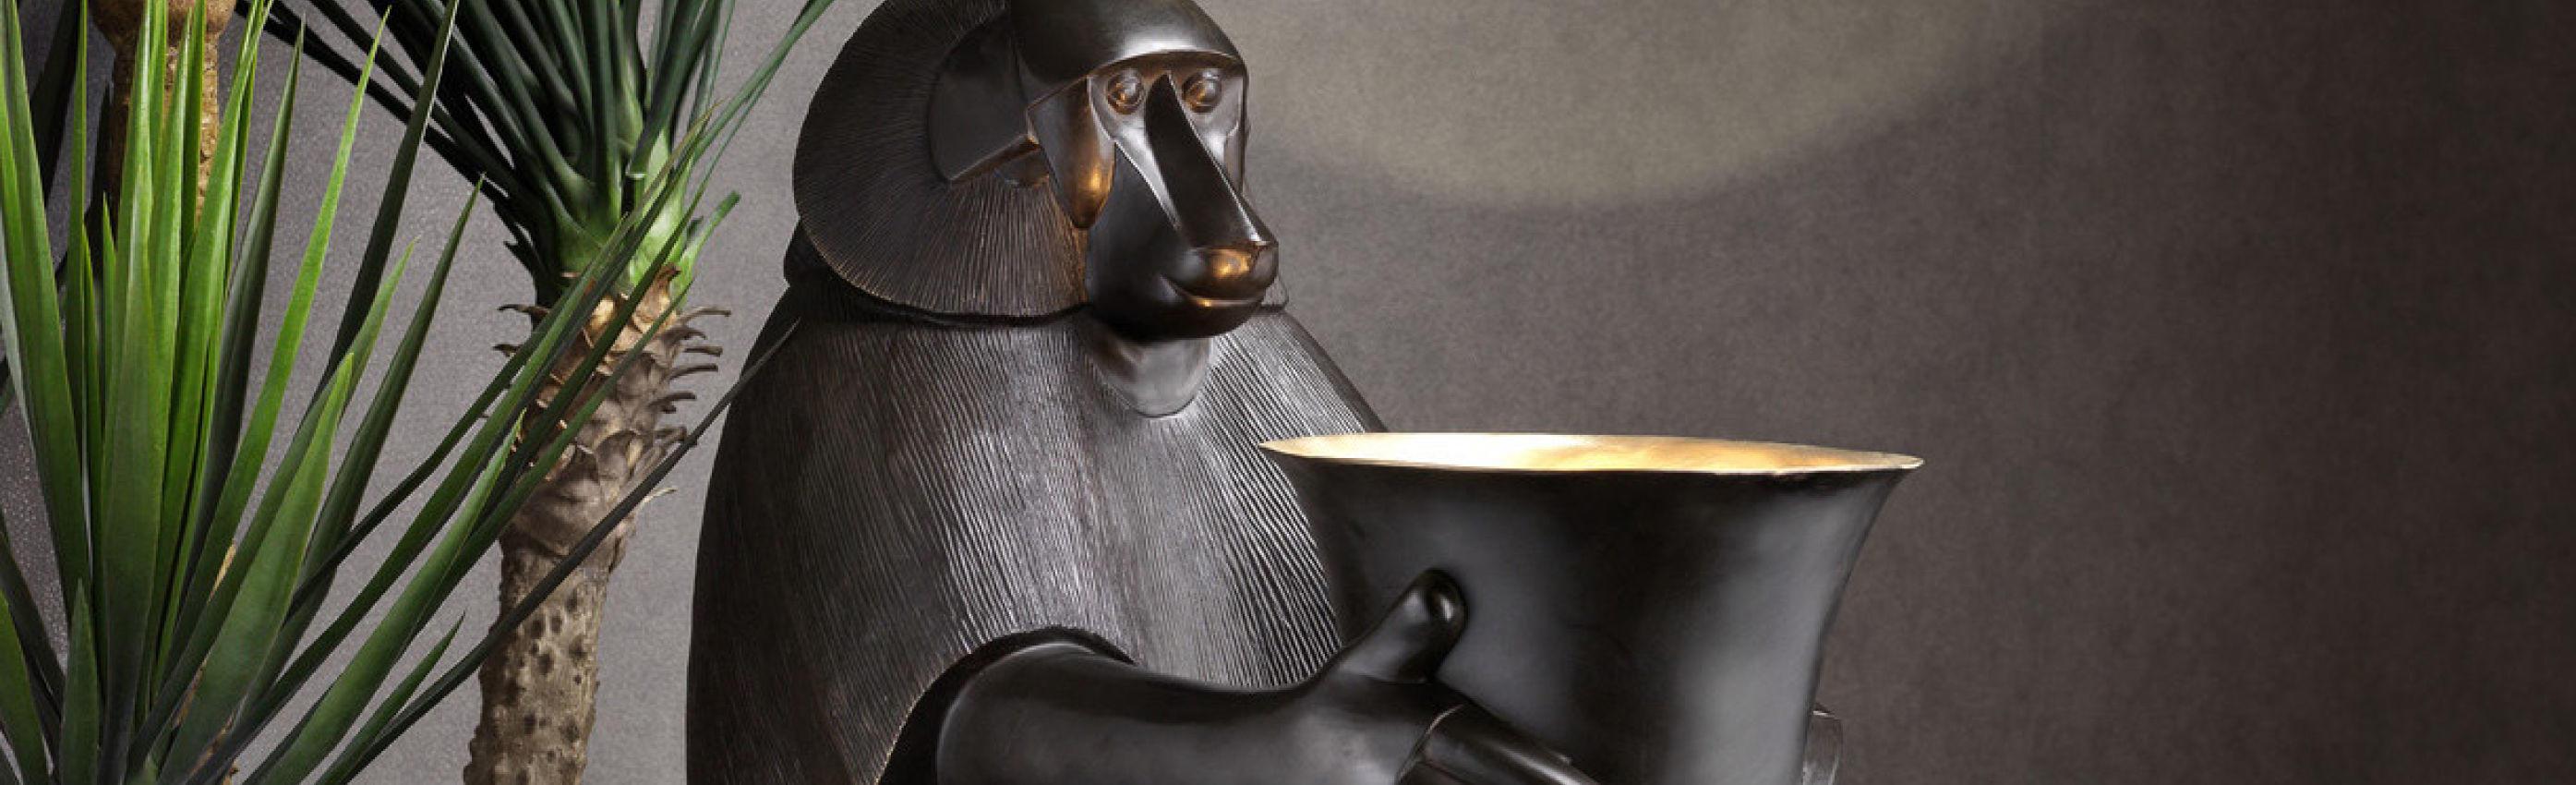 Bronzes, sculptures & statues